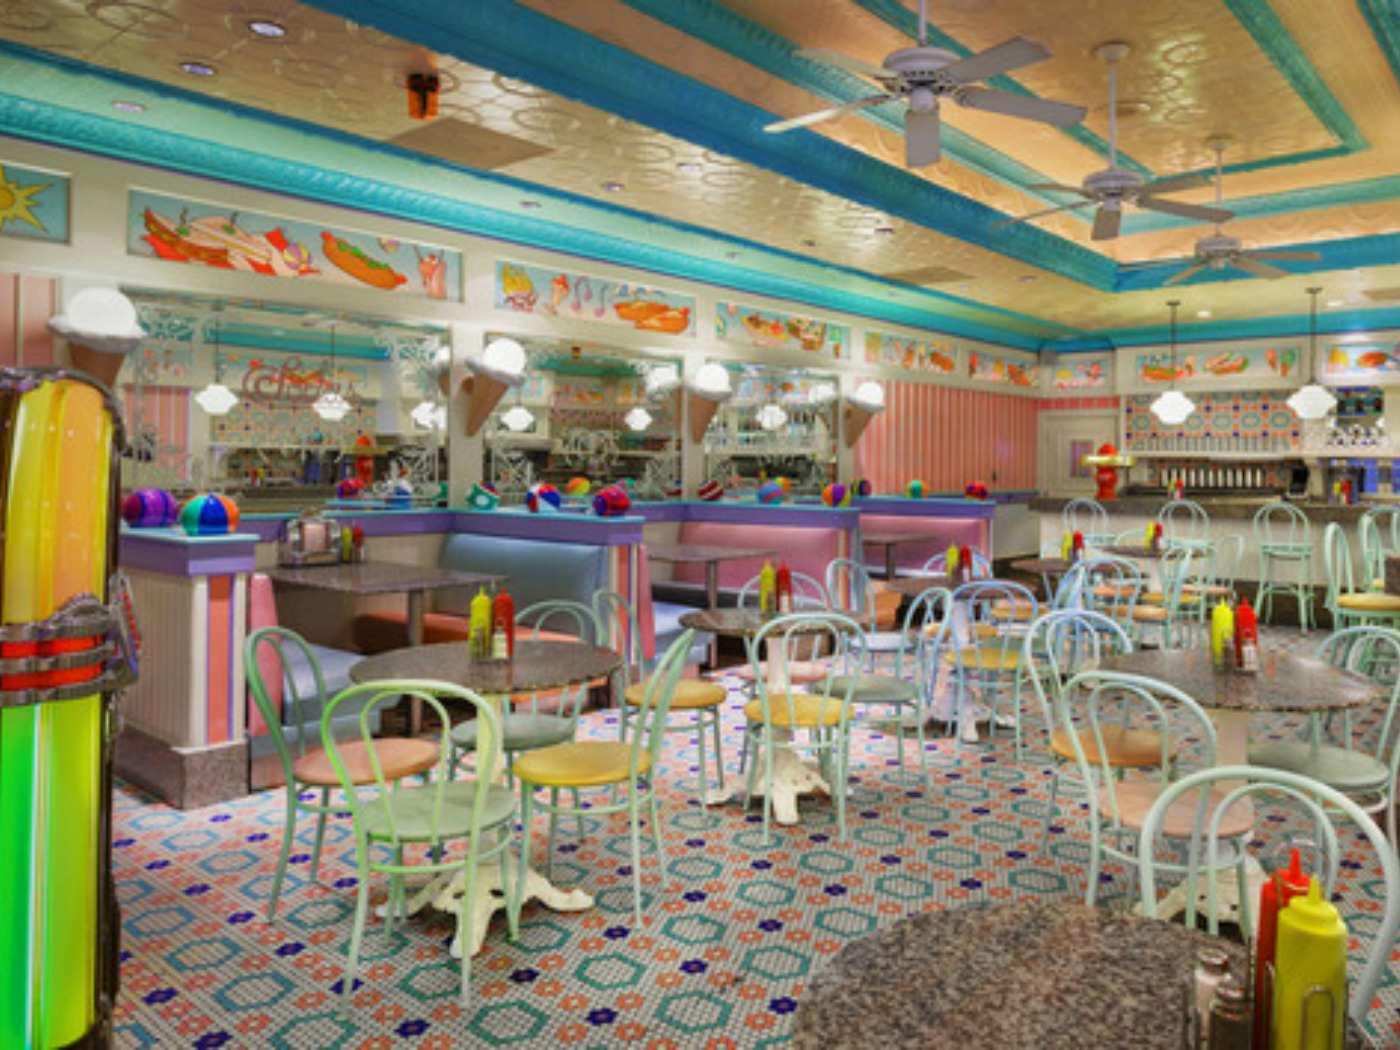 Beaches Cream parlor